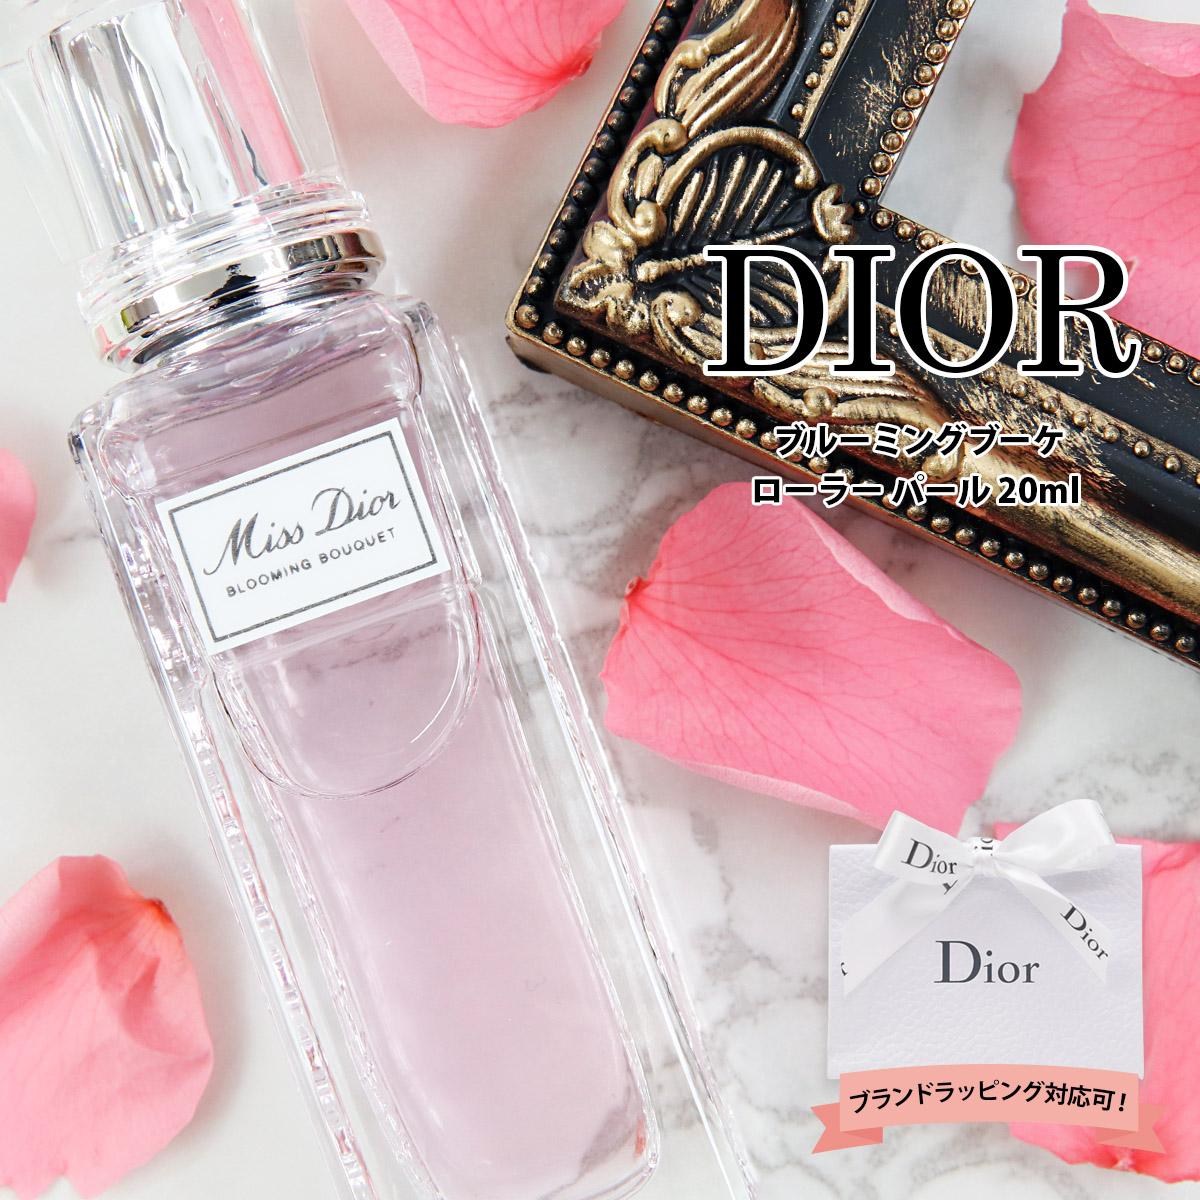 quality design 8e74c 2e862 名入れ クリスチャンディオール Christian Dior 香水 フレグランス ミス ディオール ブルーミング ブーケ ローラー パール 20ml  ロールオン 正規品 セールブランド 新品 新作 2019年 ギフト|ワールドギフト カヴァティーナ